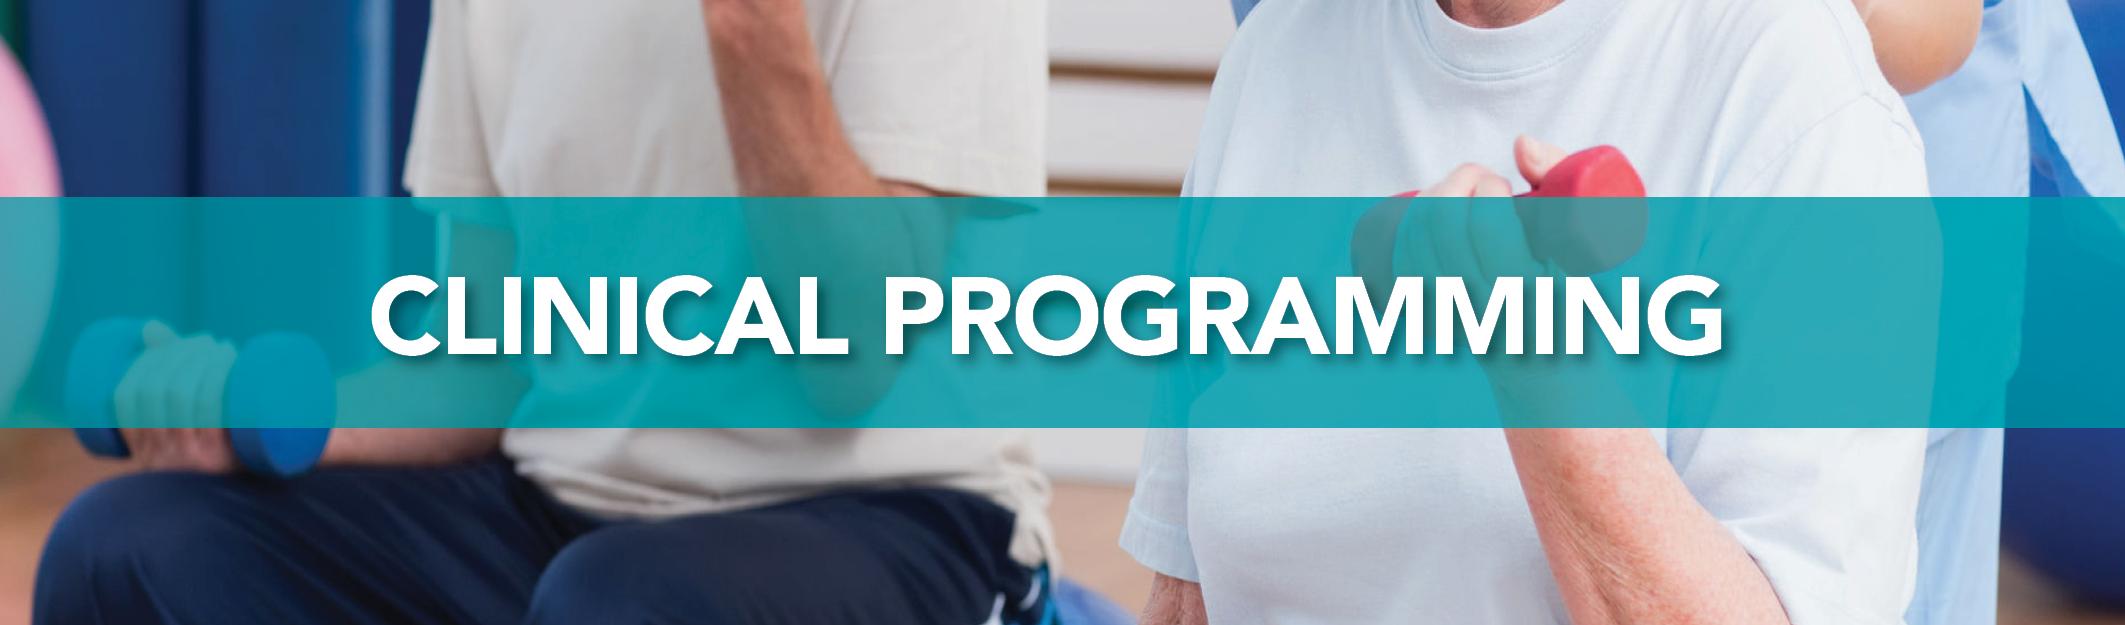 Clinical Programming Header_120220-1